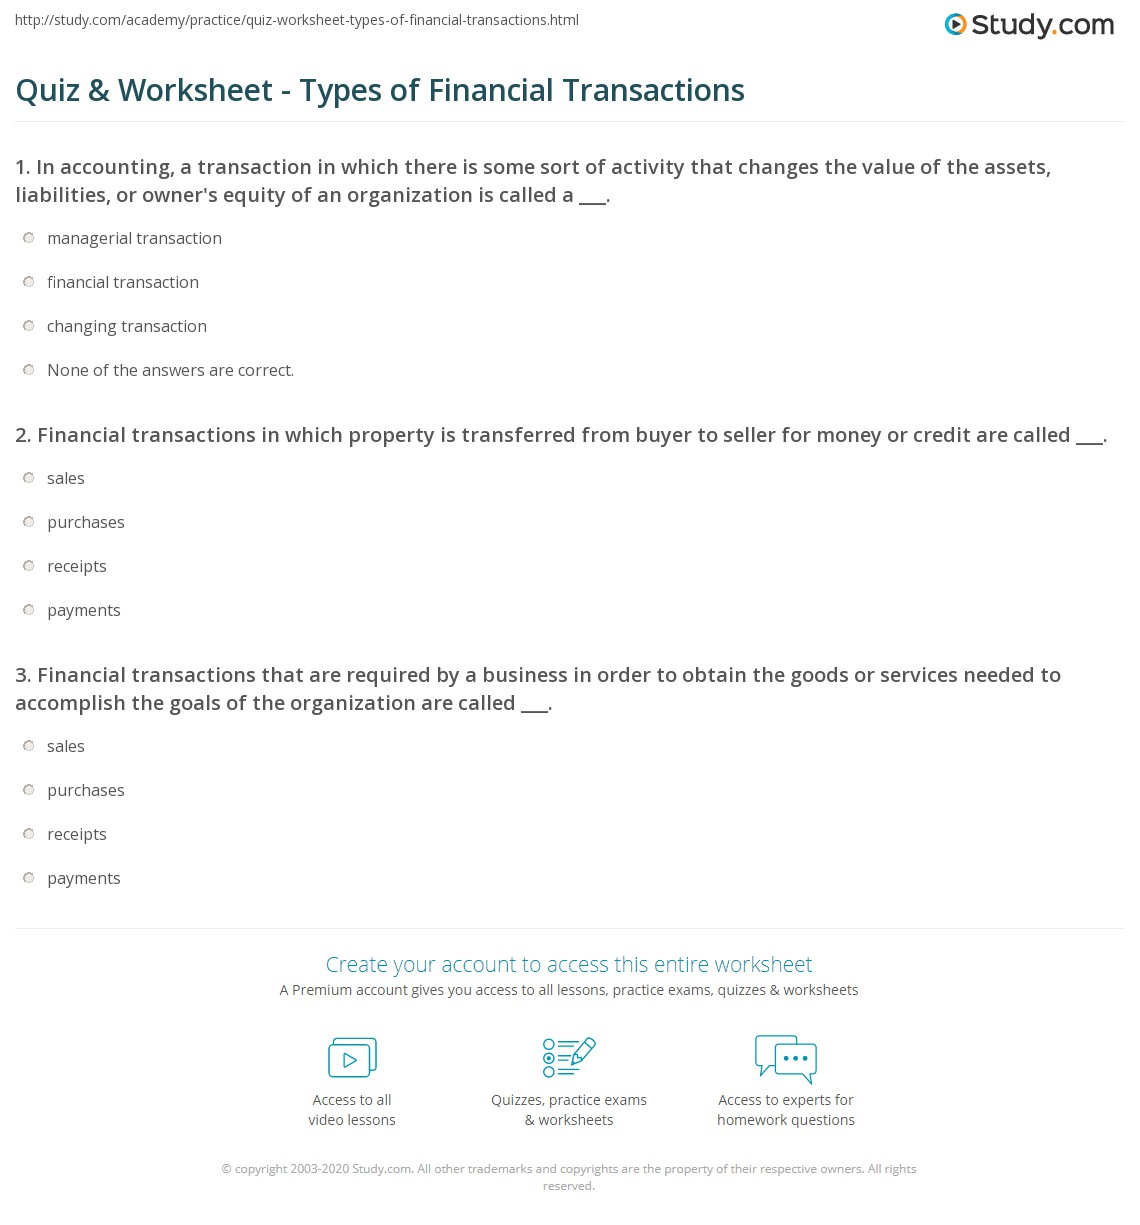 Quiz & Worksheet - Types of Financial Transactions | Study.com